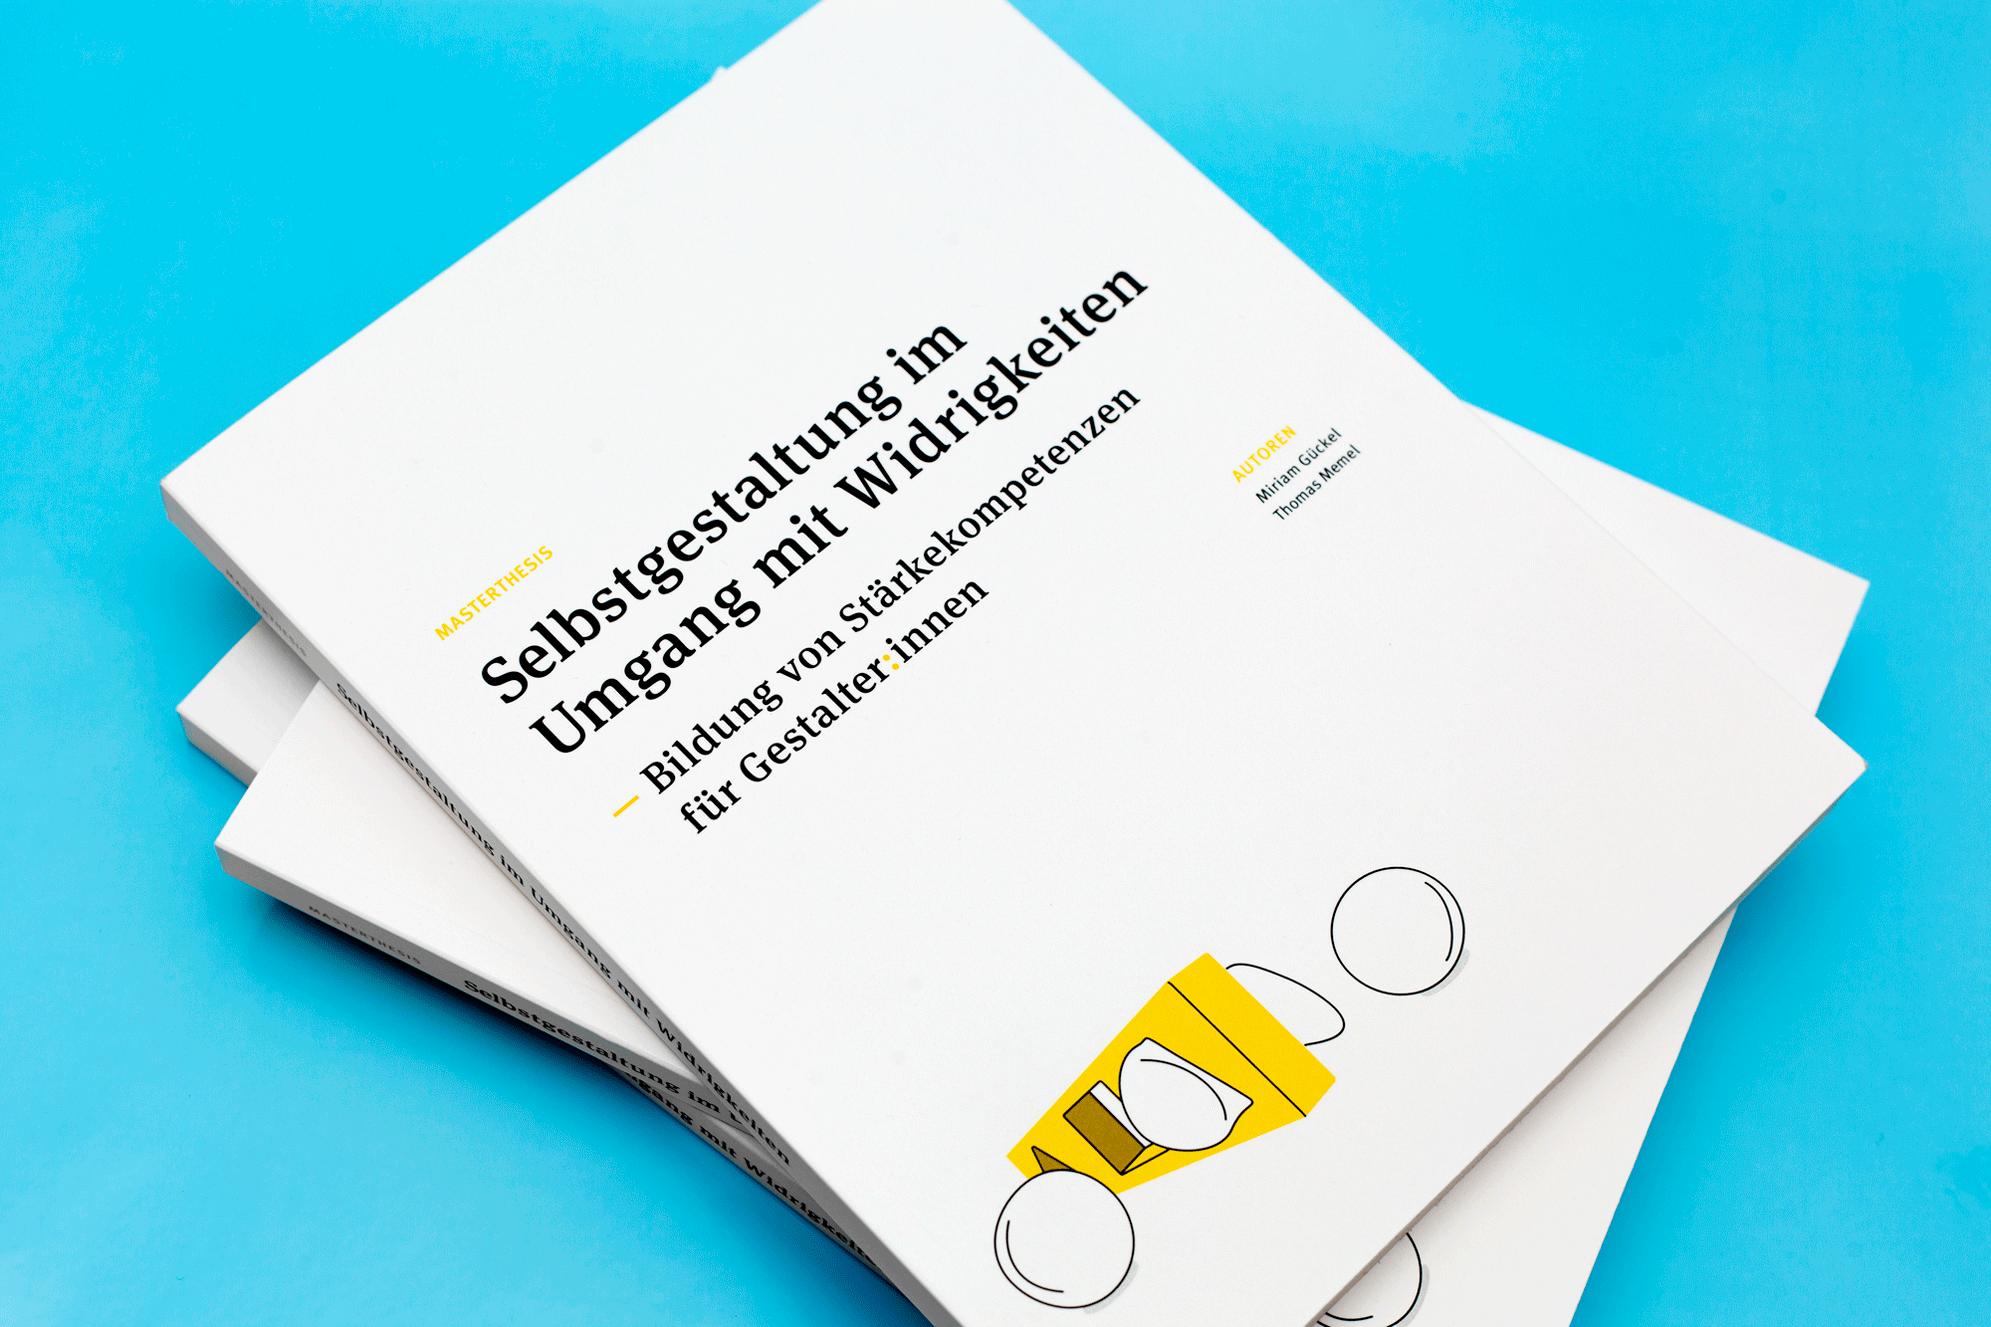 Selbstgestaltung – Kompetenztraining für Gestalter:innen Miriam Gückel Call for Creatives